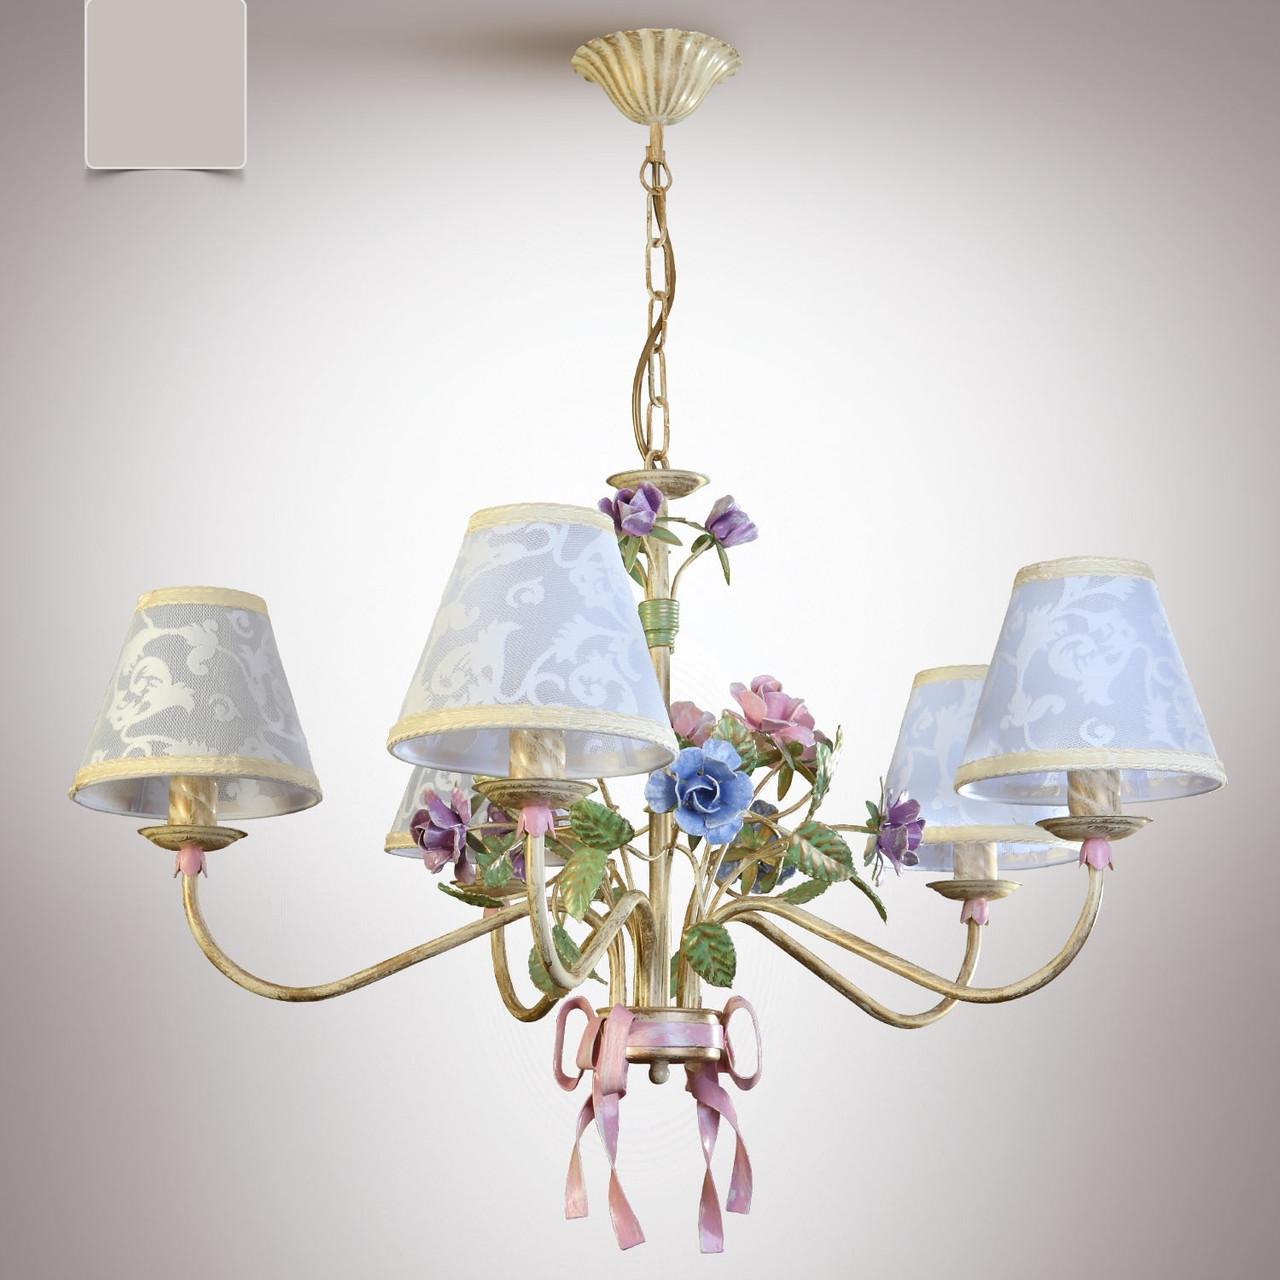 Люстра для большой комнаты, для спальни 5 ламповая с абажурами  6405-3